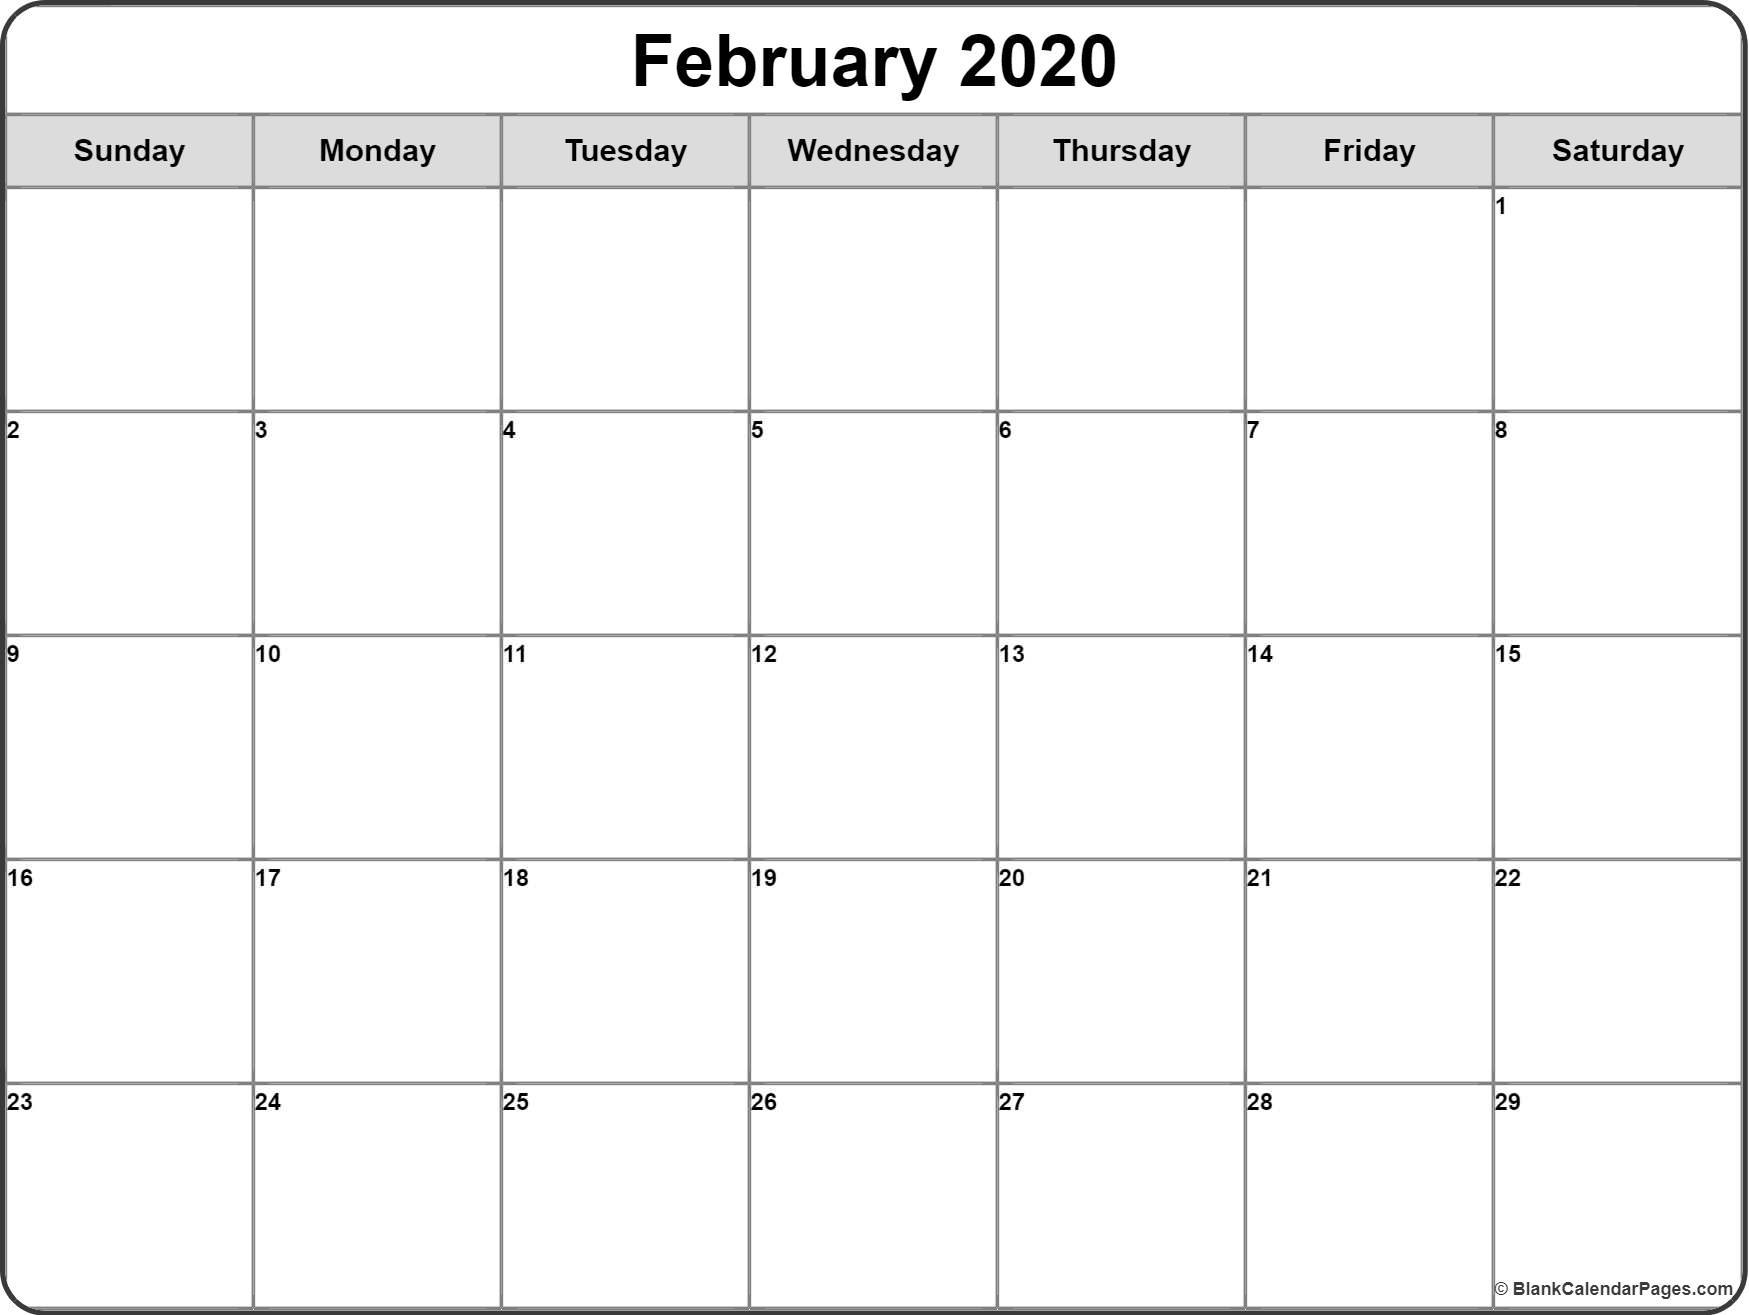 February 2020 Calendar | Free Printable Monthly Calendars